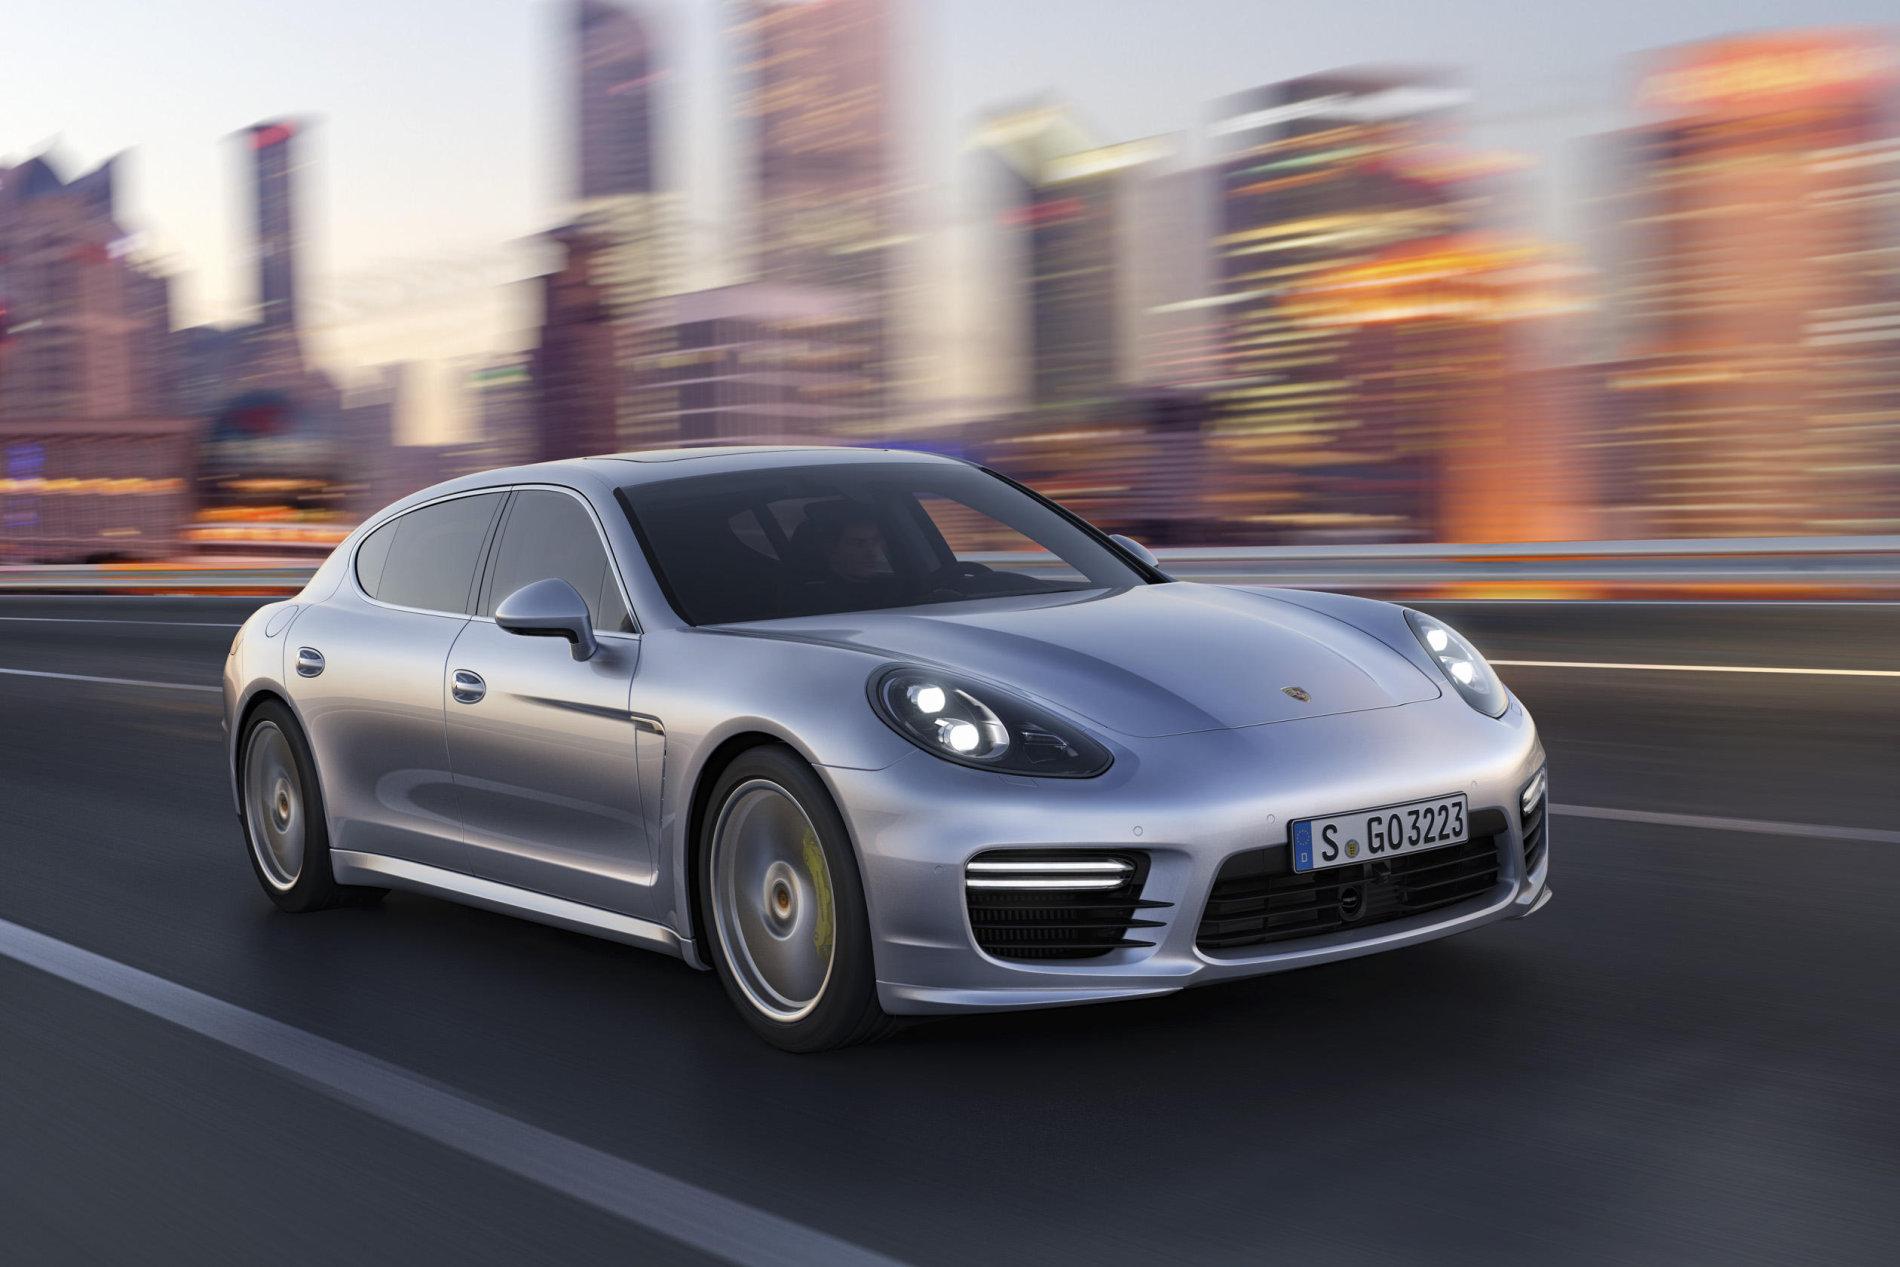 Porsche Panamera Facelift - Porsche Panamera Facelift